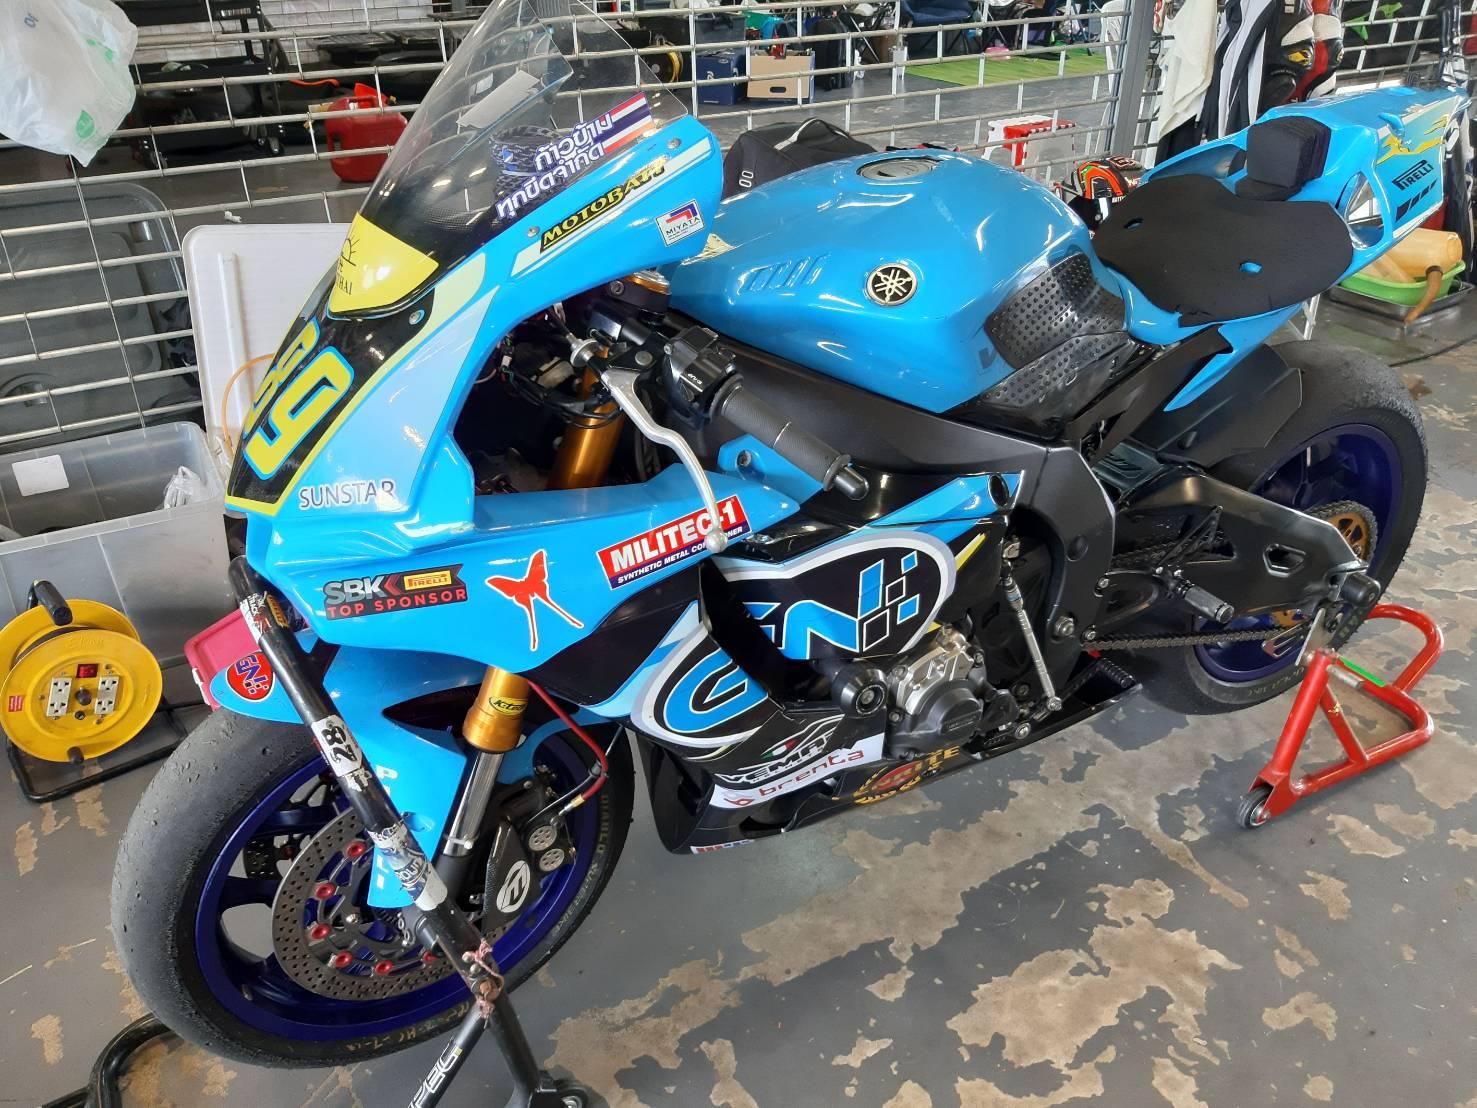 Sunstar ได้เป็น sponsor ให้กับทีม Miyata SC PTT Racing